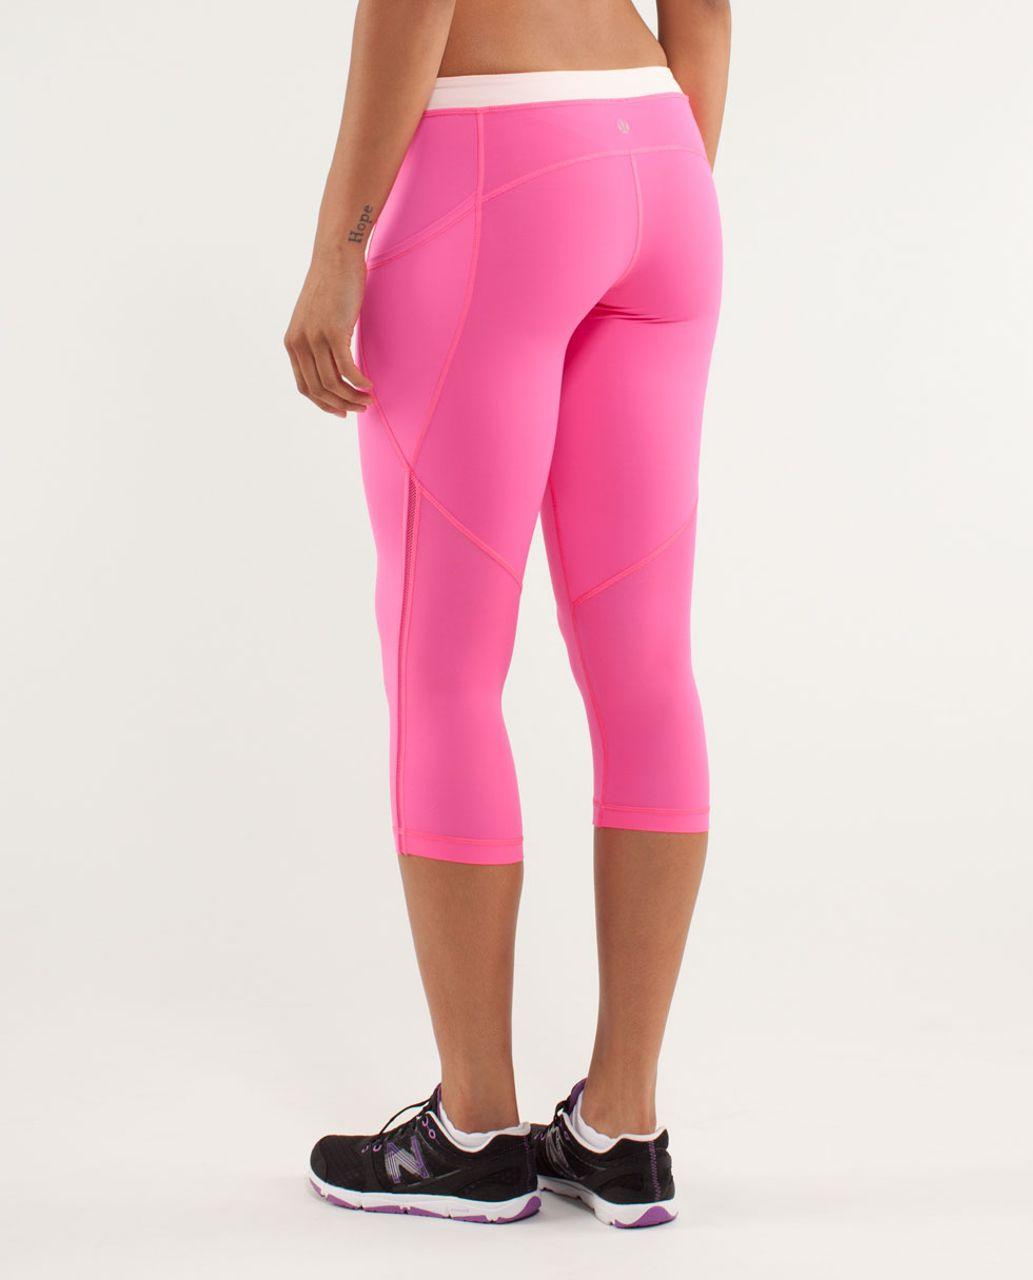 Lululemon Beach Runner Crop - Pinkelicious / Parfait Pink